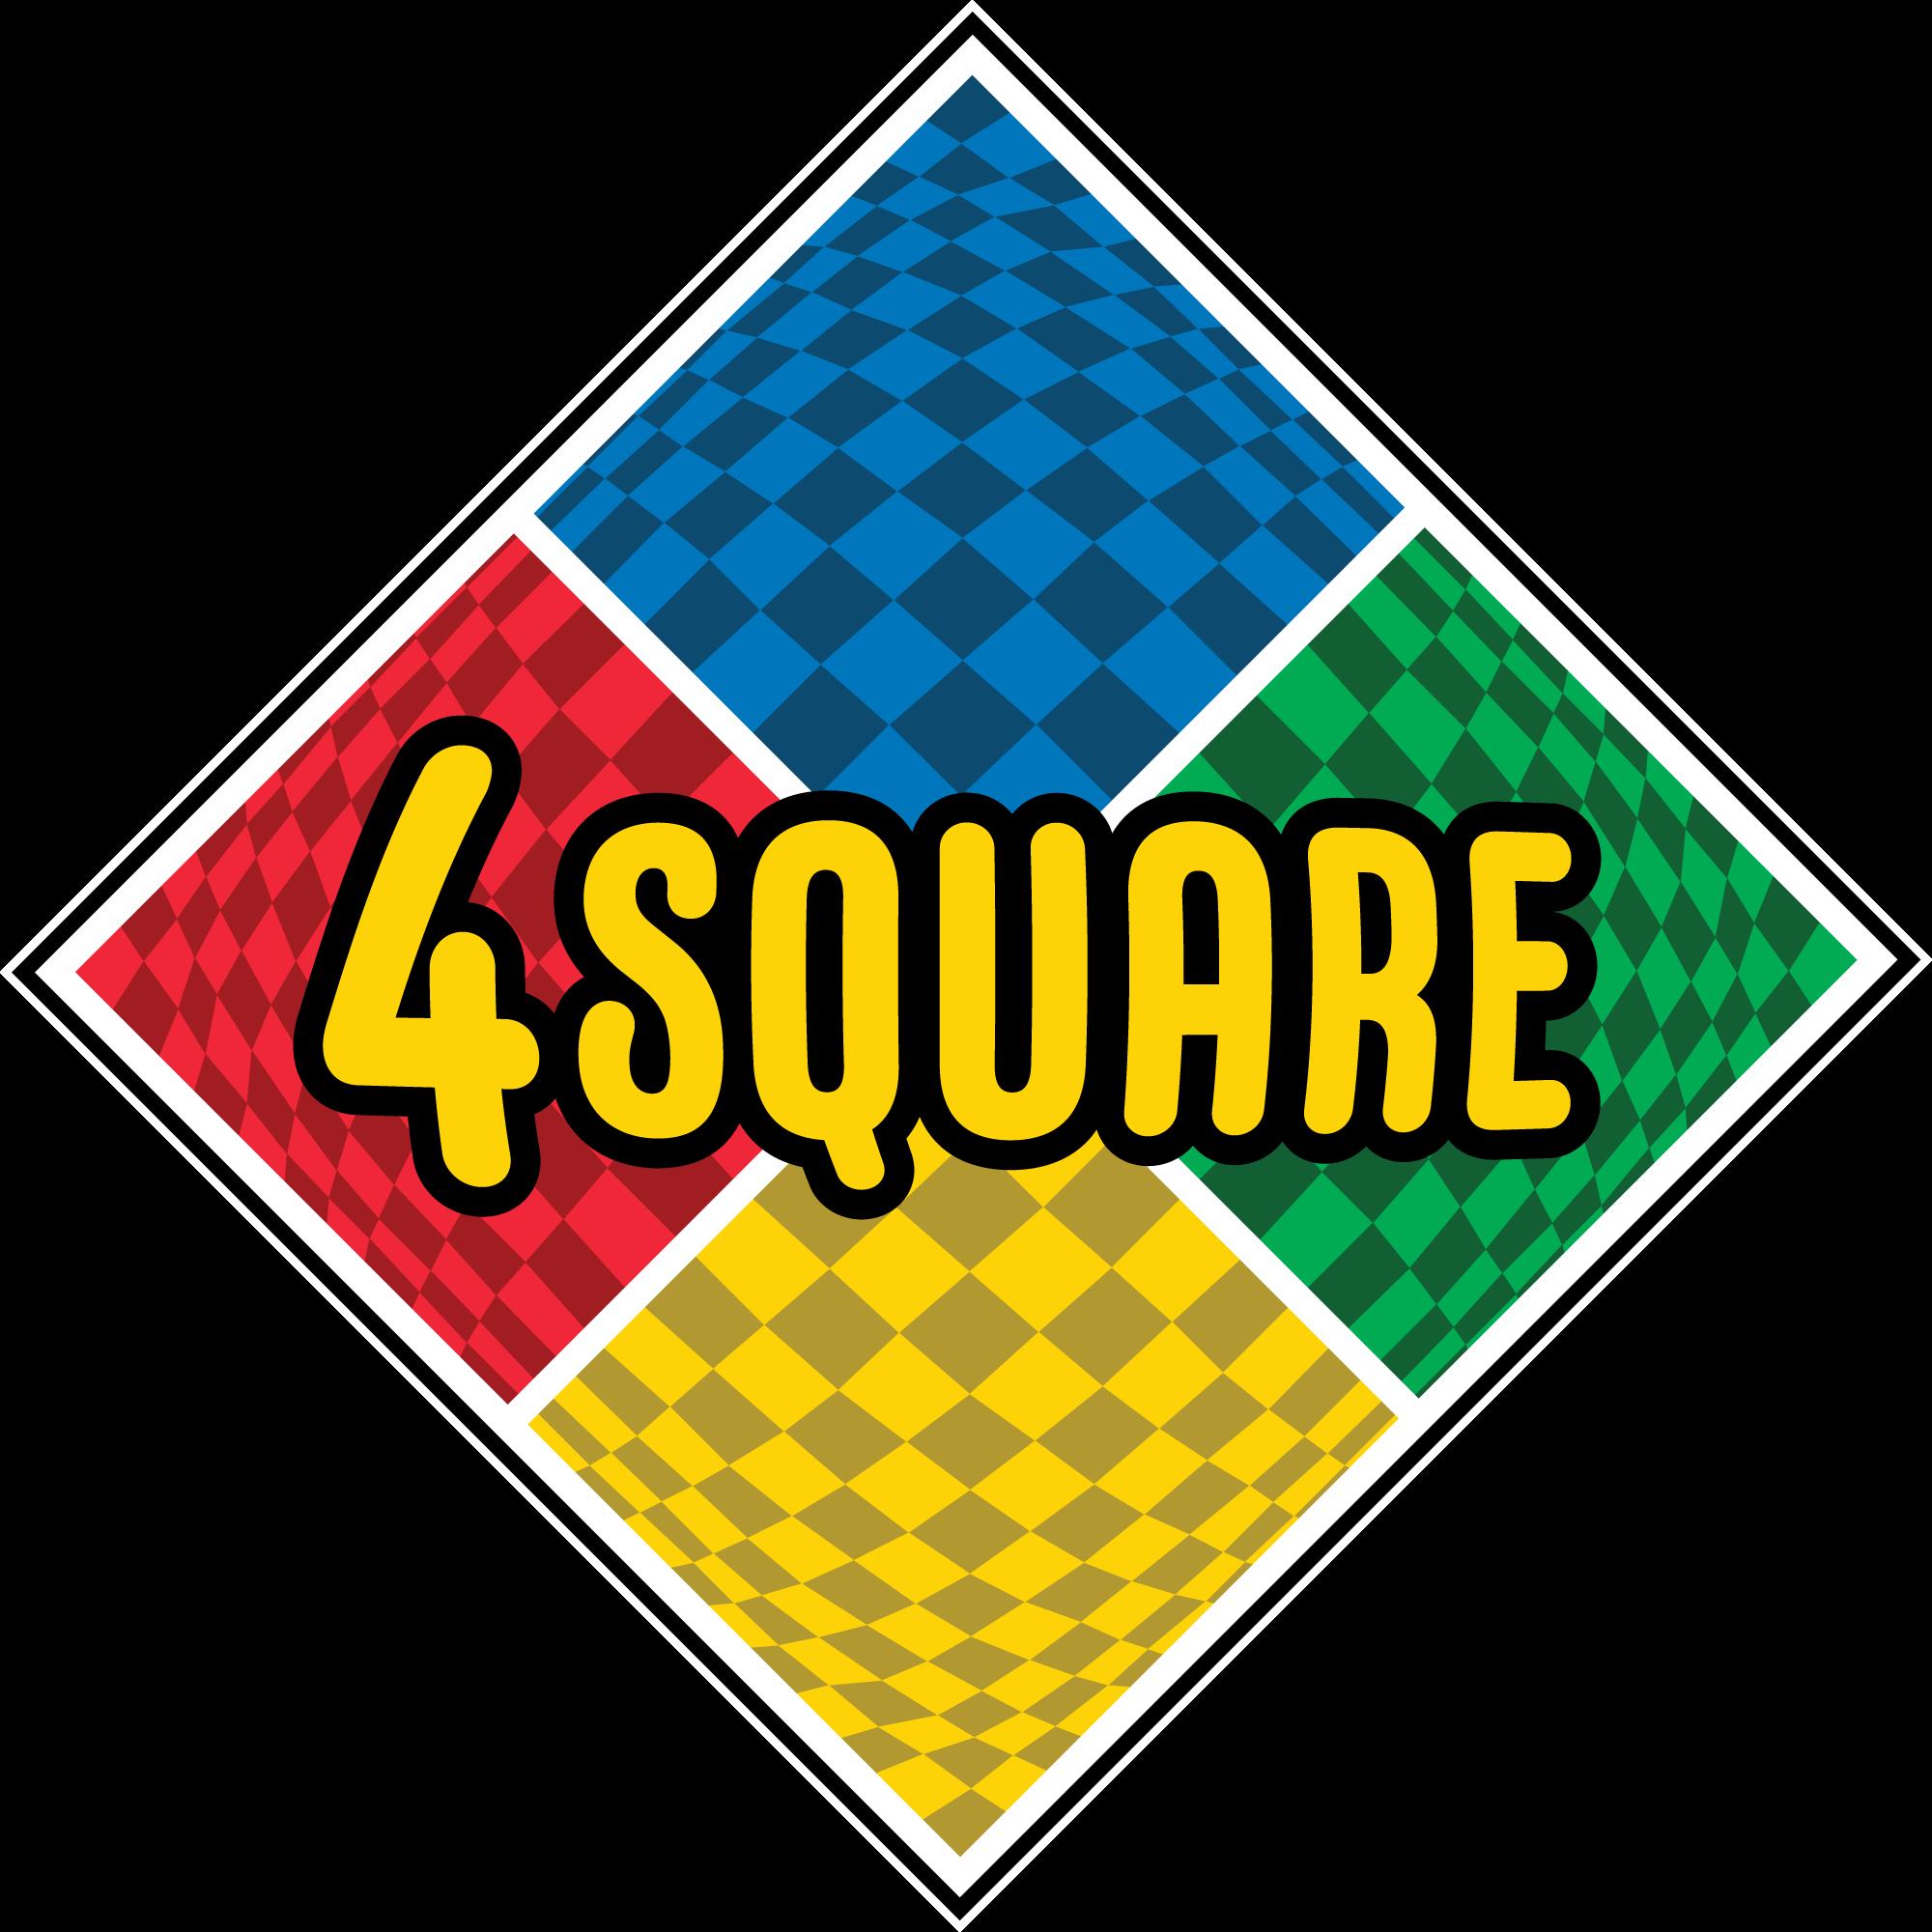 4 Square Logo #2